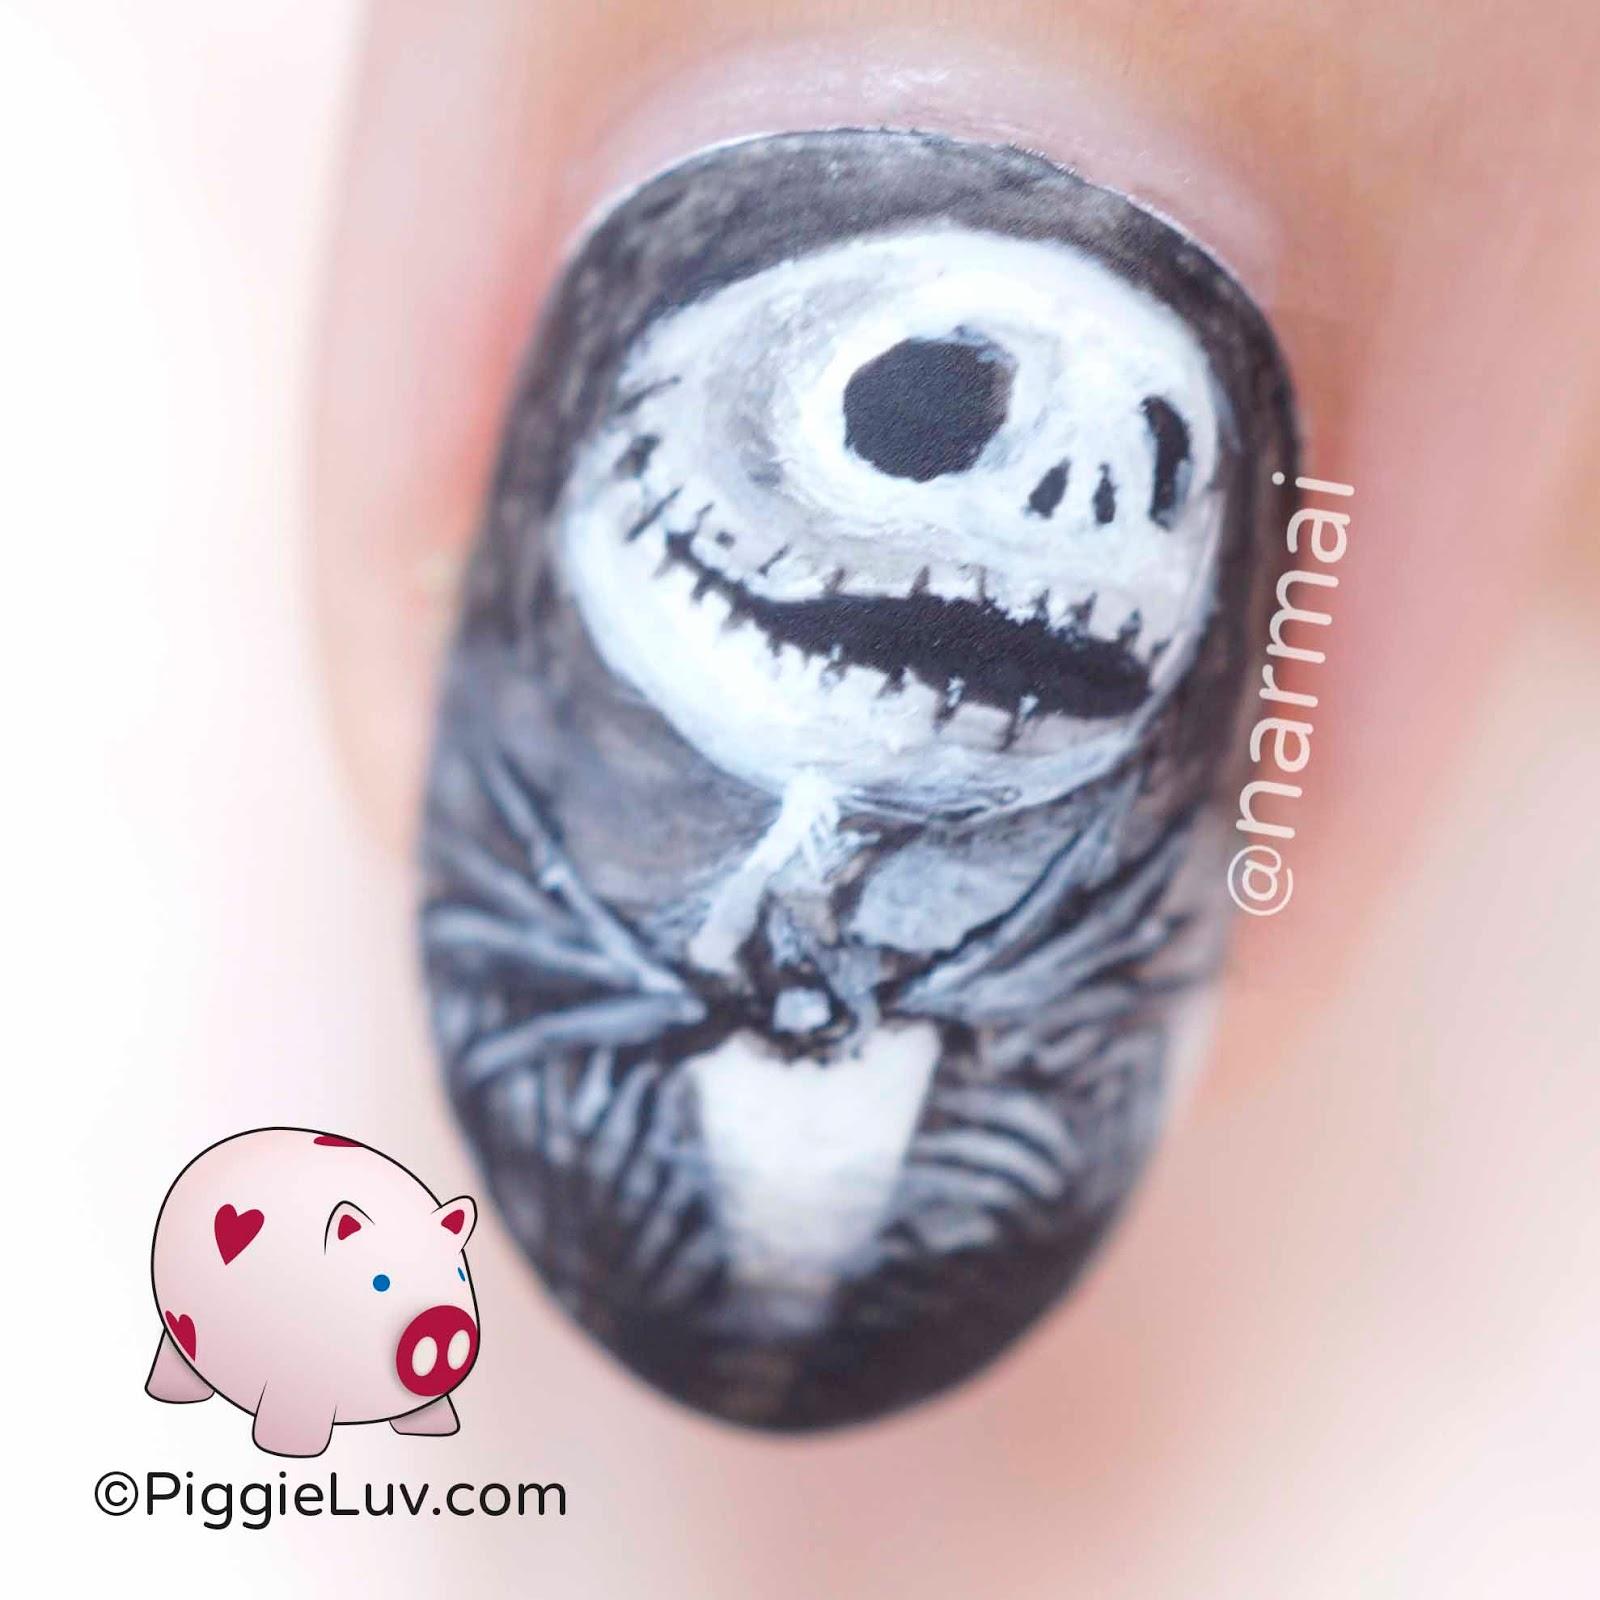 PiggieLuv: Jack Skellington nail art for Halloween